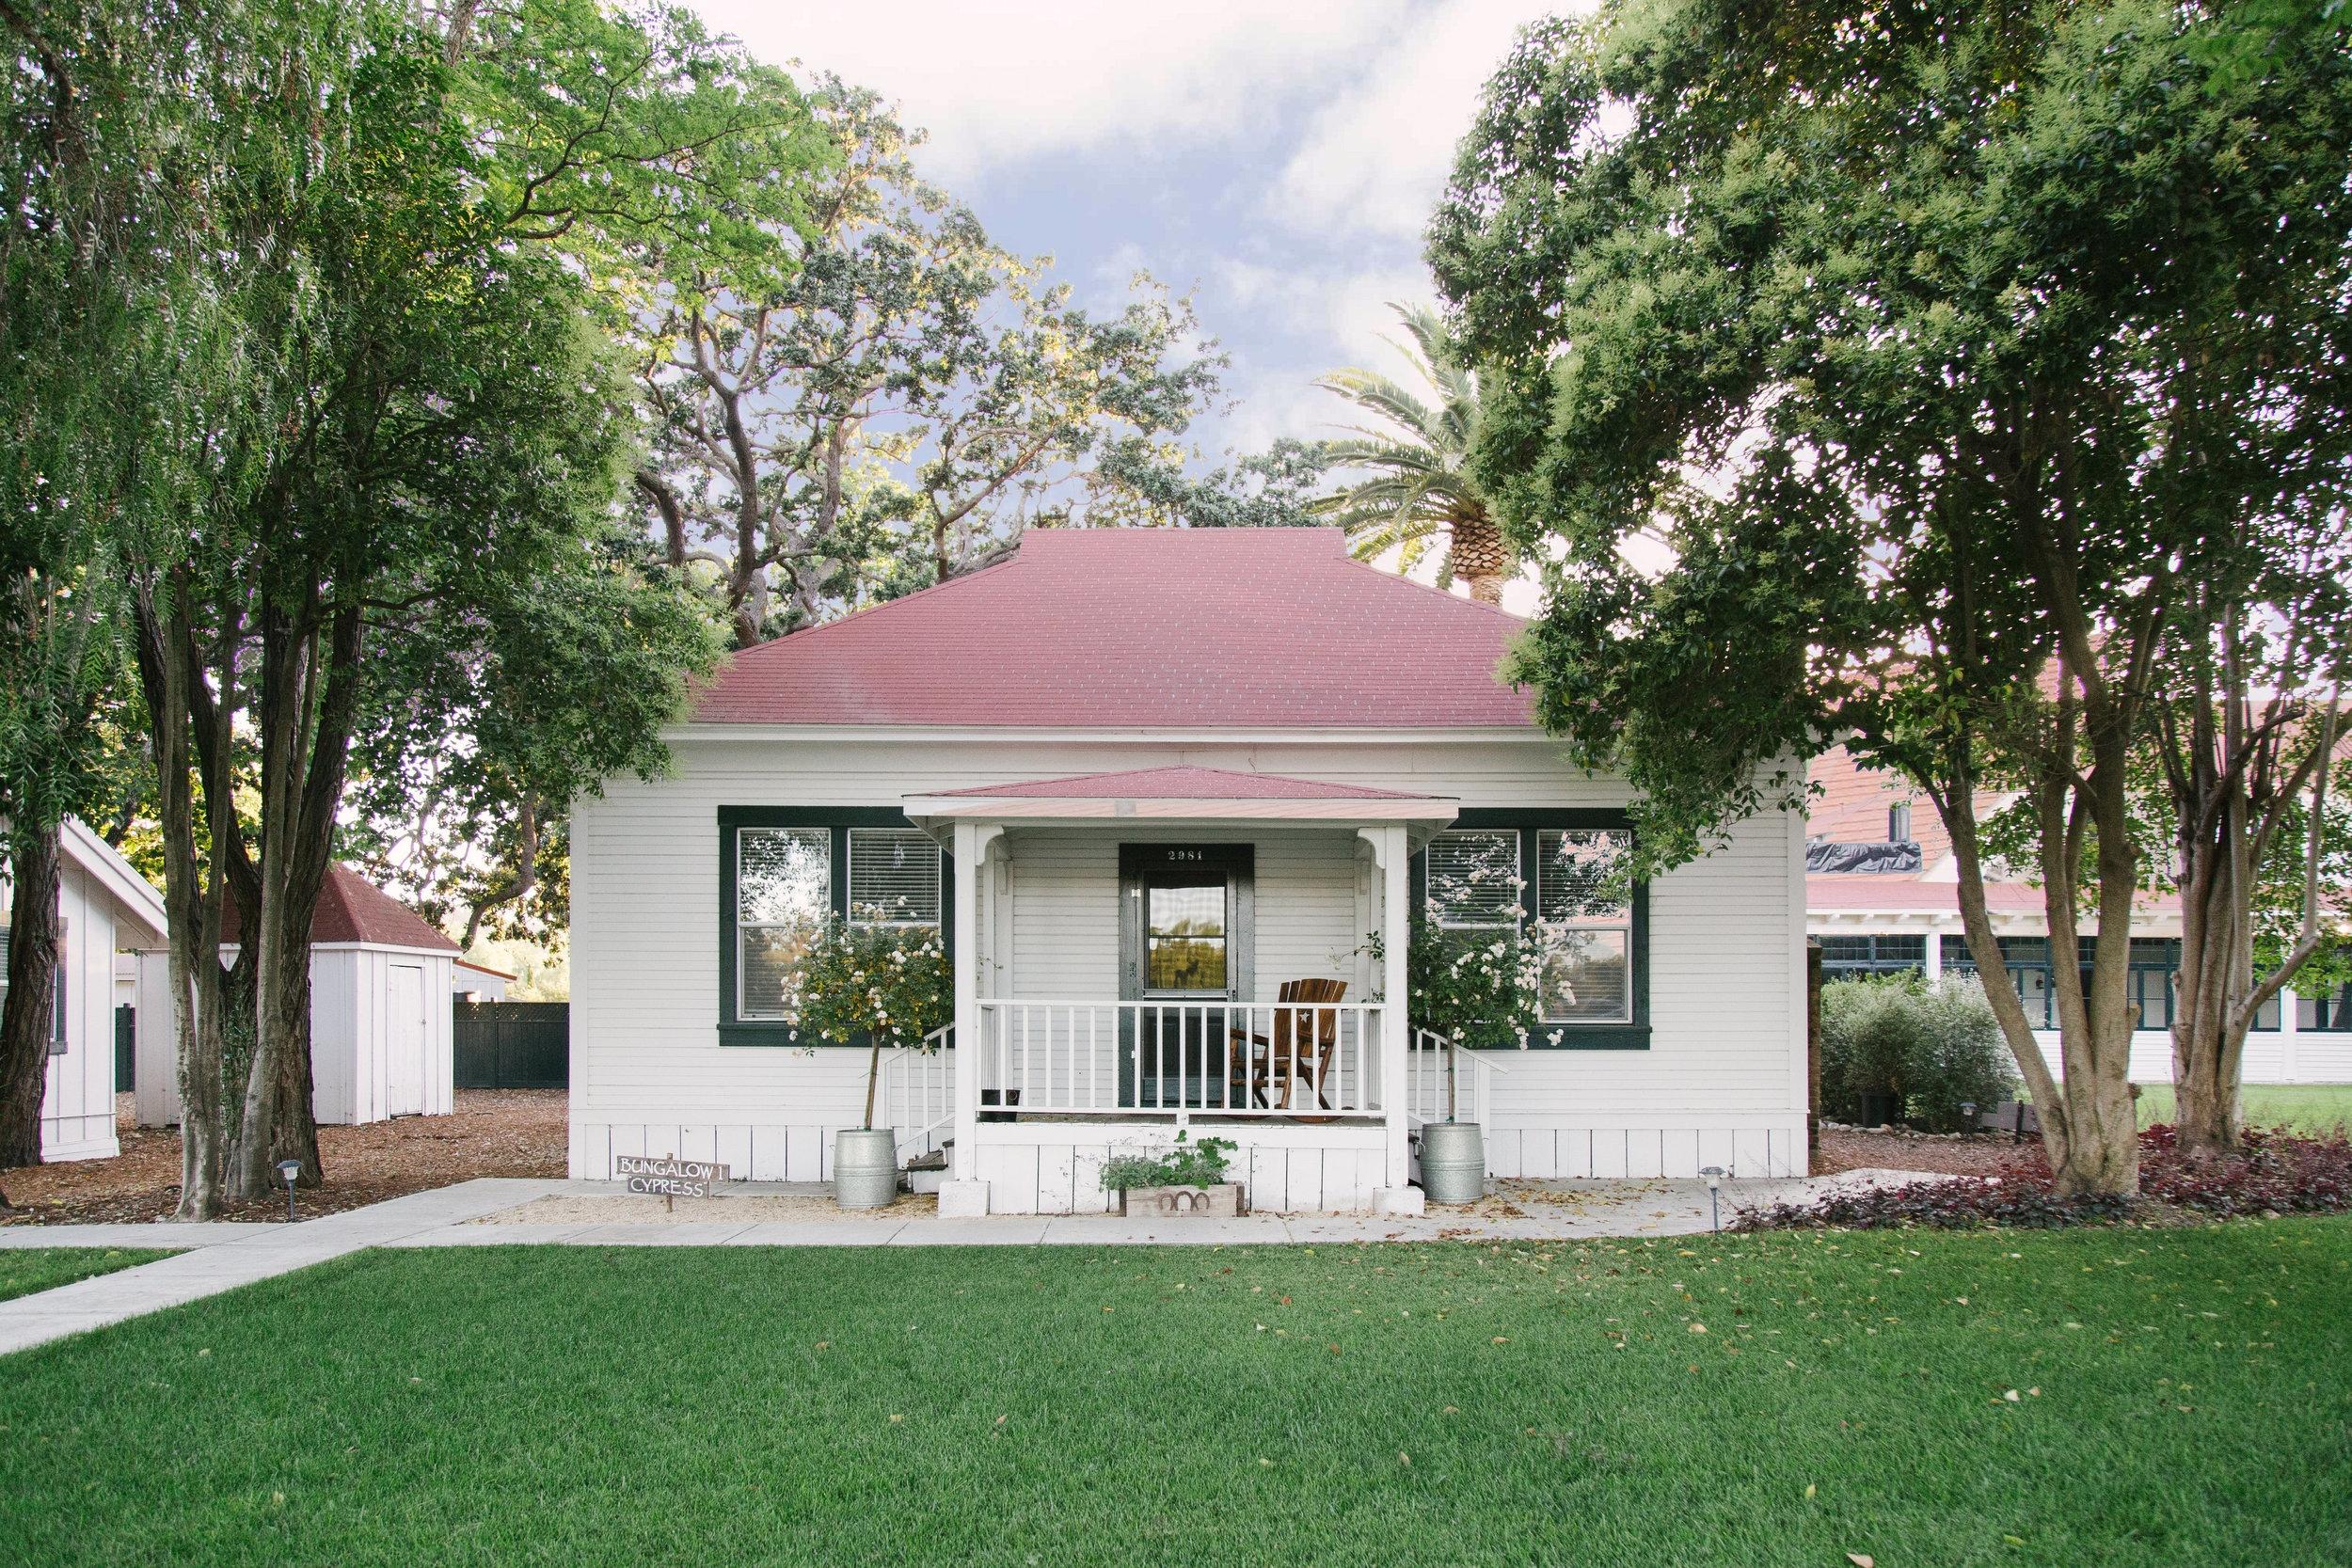 Bungalow 1 - Cypress - 2 bedrooms, 1 bathroom, accommodates 4